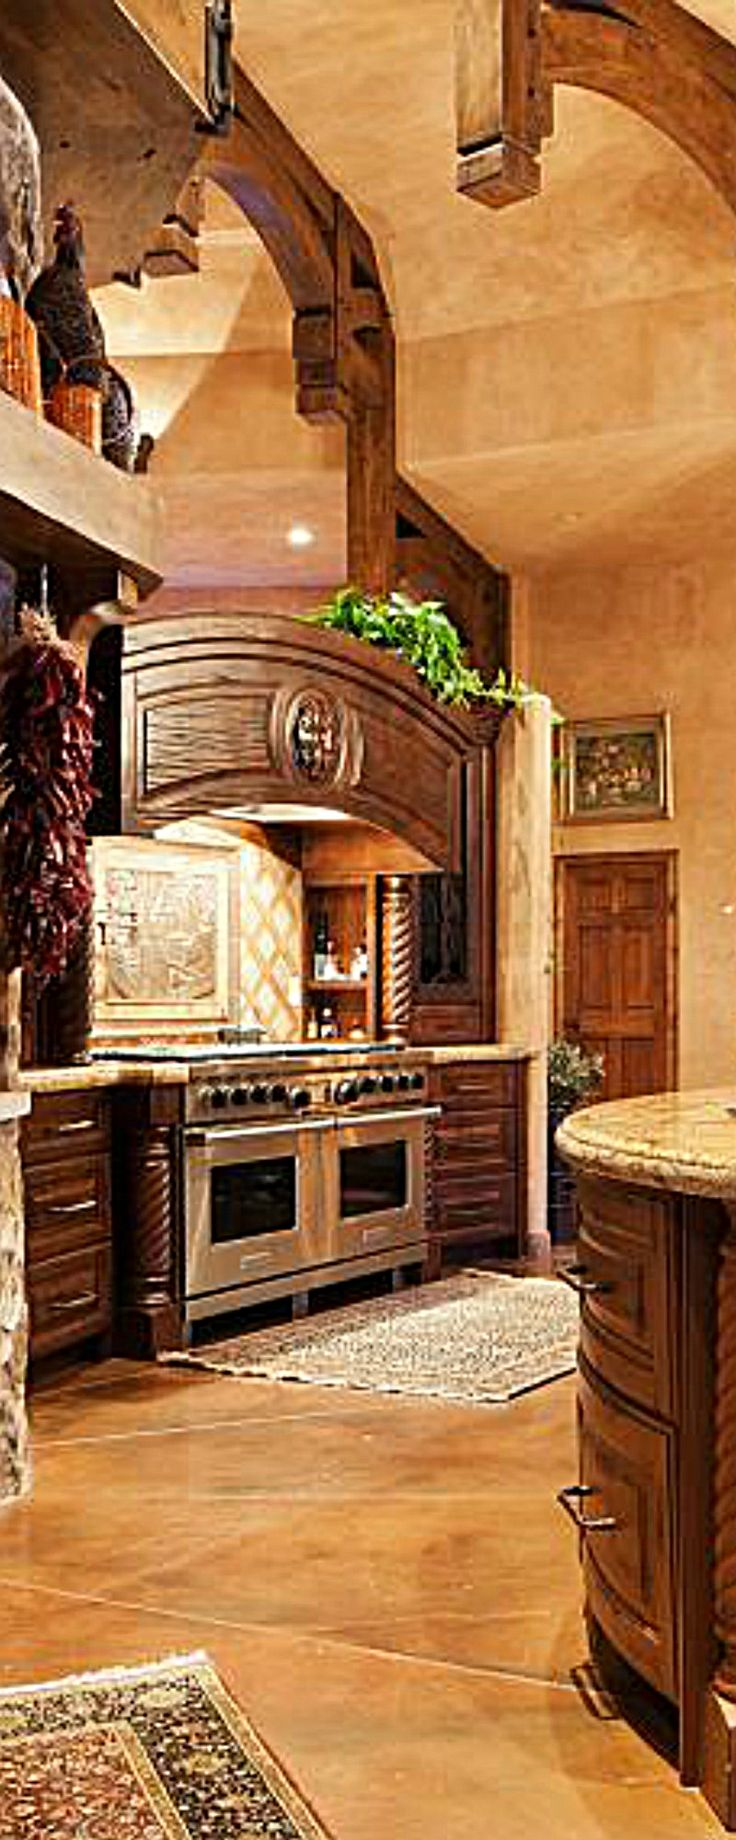 Pics Photos Tuscan Decorating Ideas Kitchen Decor Small Tips Bringing Tuscany Http Media Cache